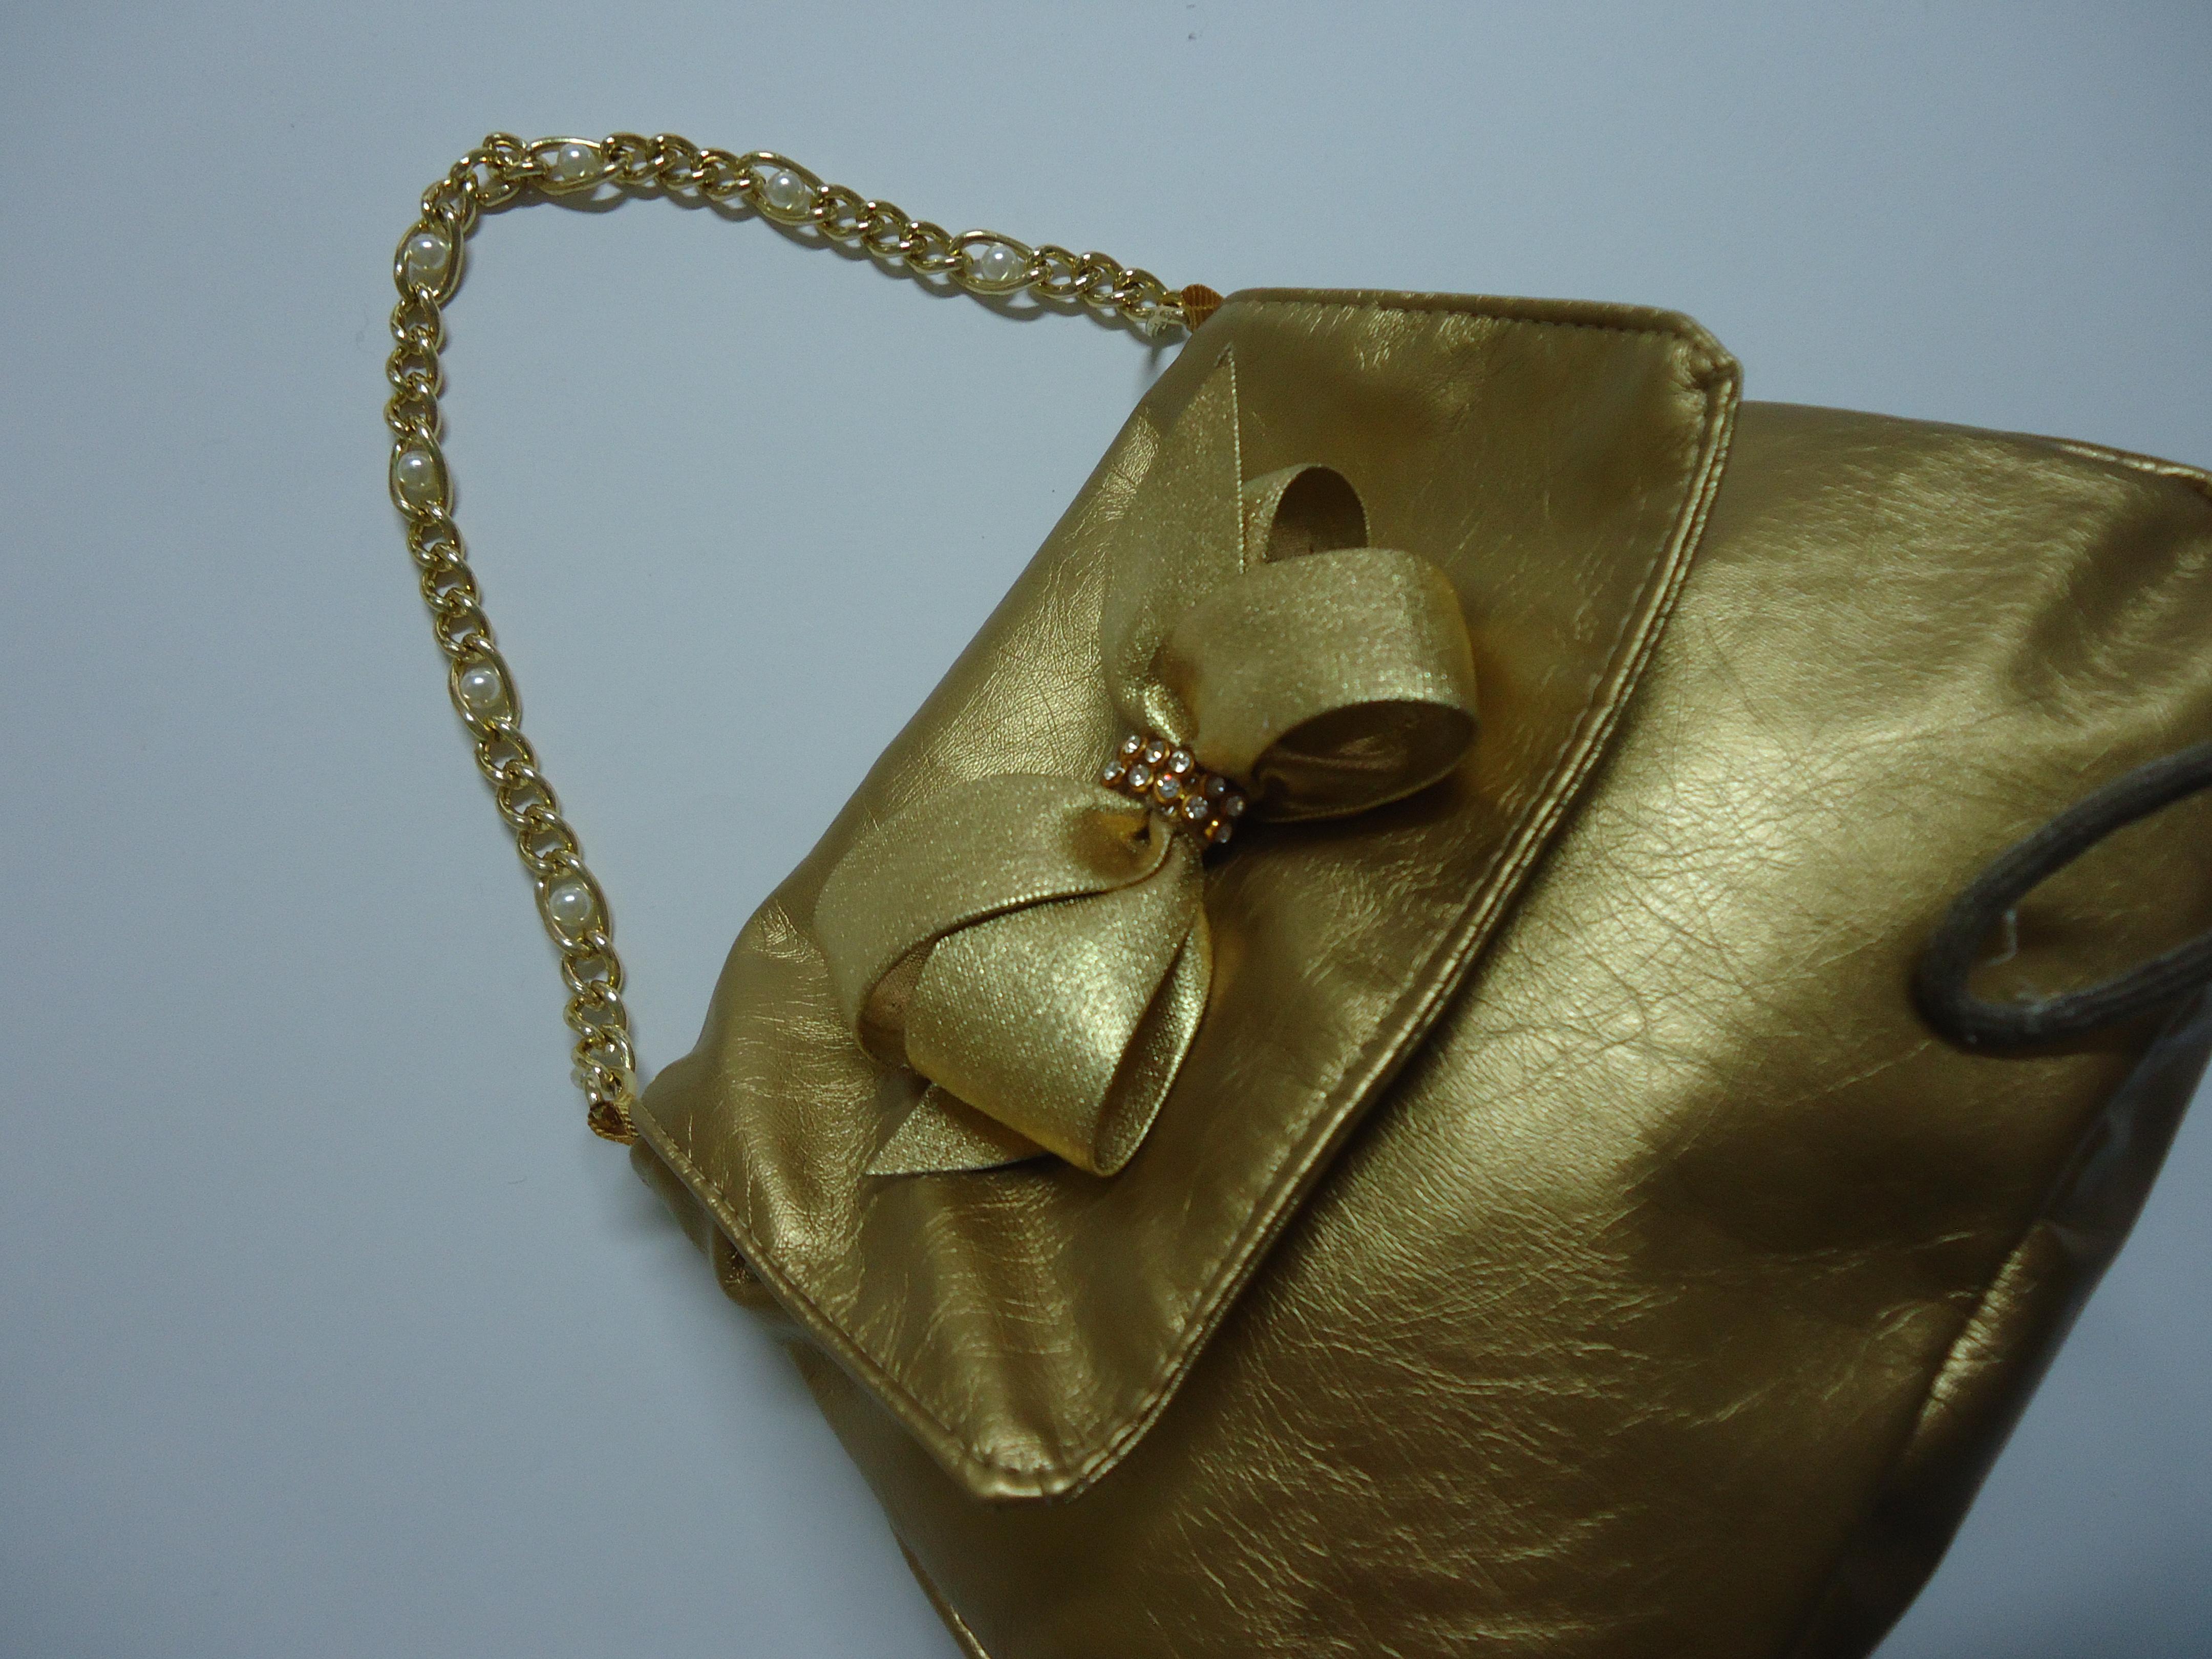 Bolsa Dourada Infantil : Bolsa infantil dourada gi menina chic acess?rios elo